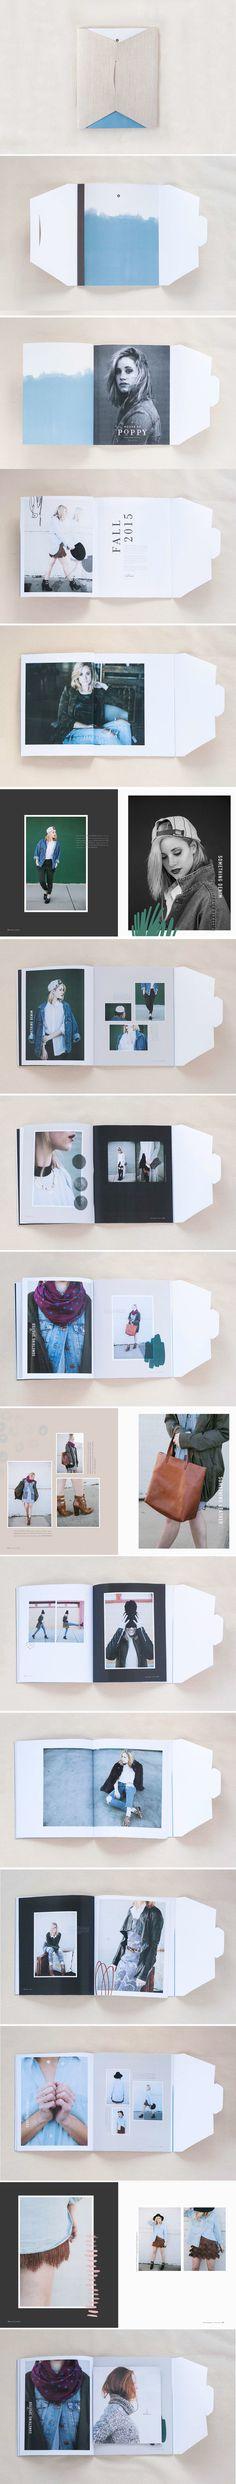 House of Poppy | Catalogue on Behance